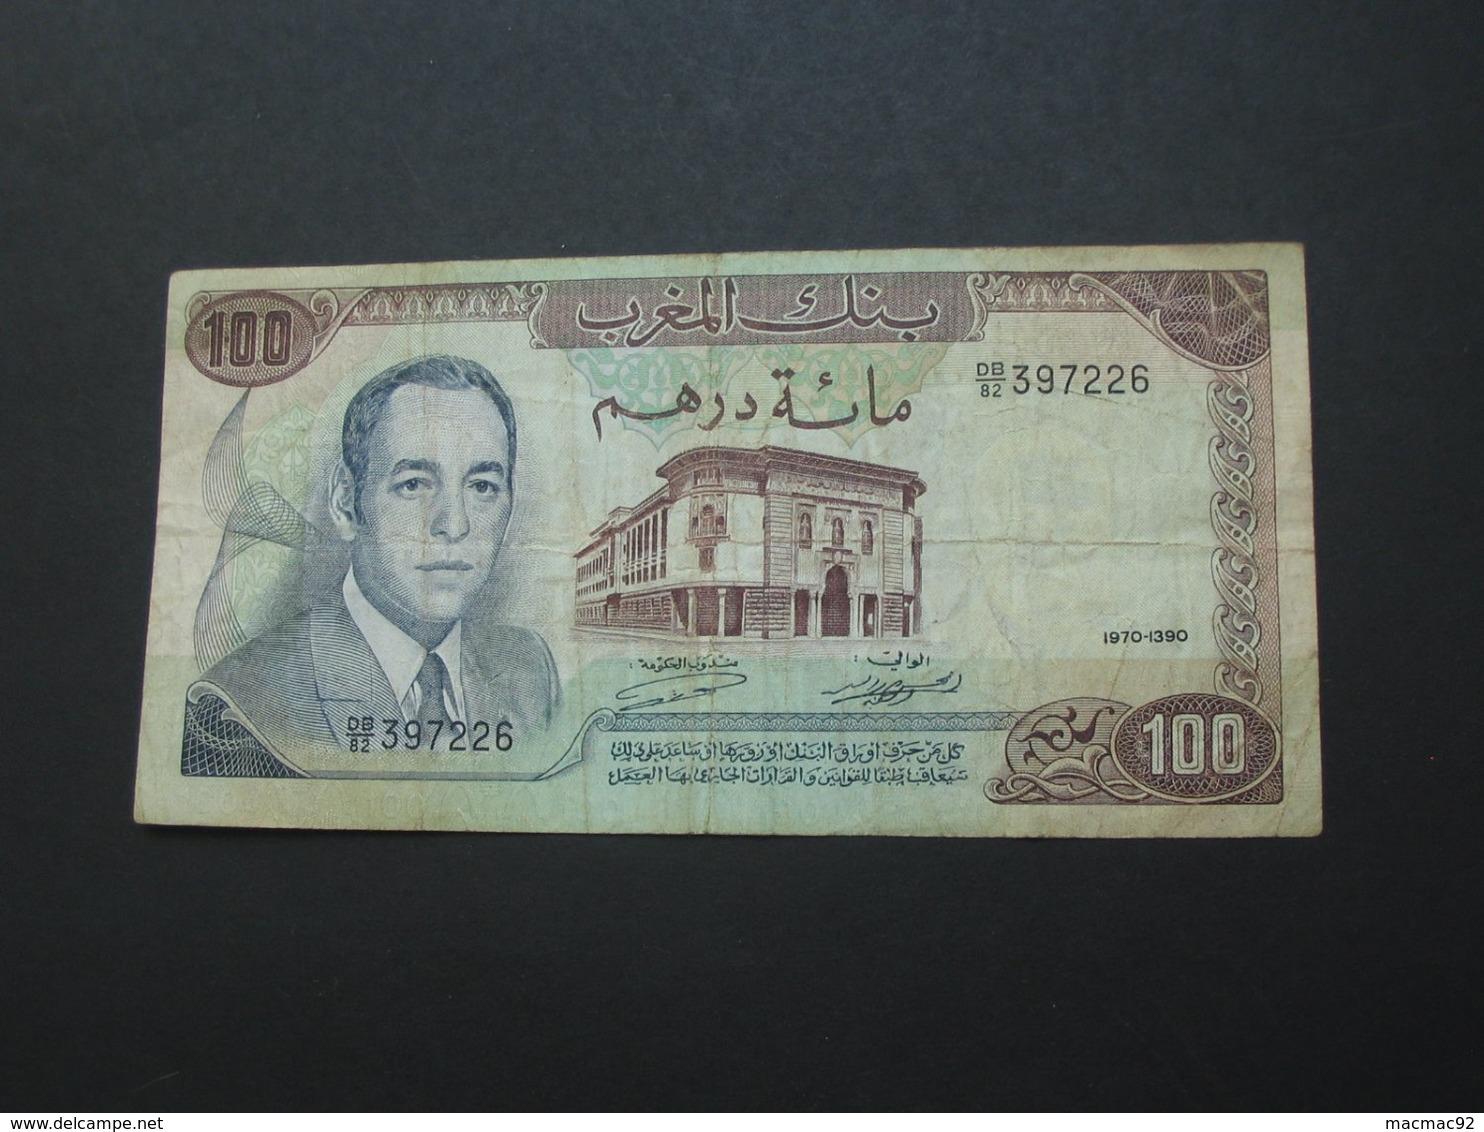 100 Dirhams 1970-1390 Maroc - Banque Du Maroc **** EN ACHAT IMMEDIAT **** - Marocco